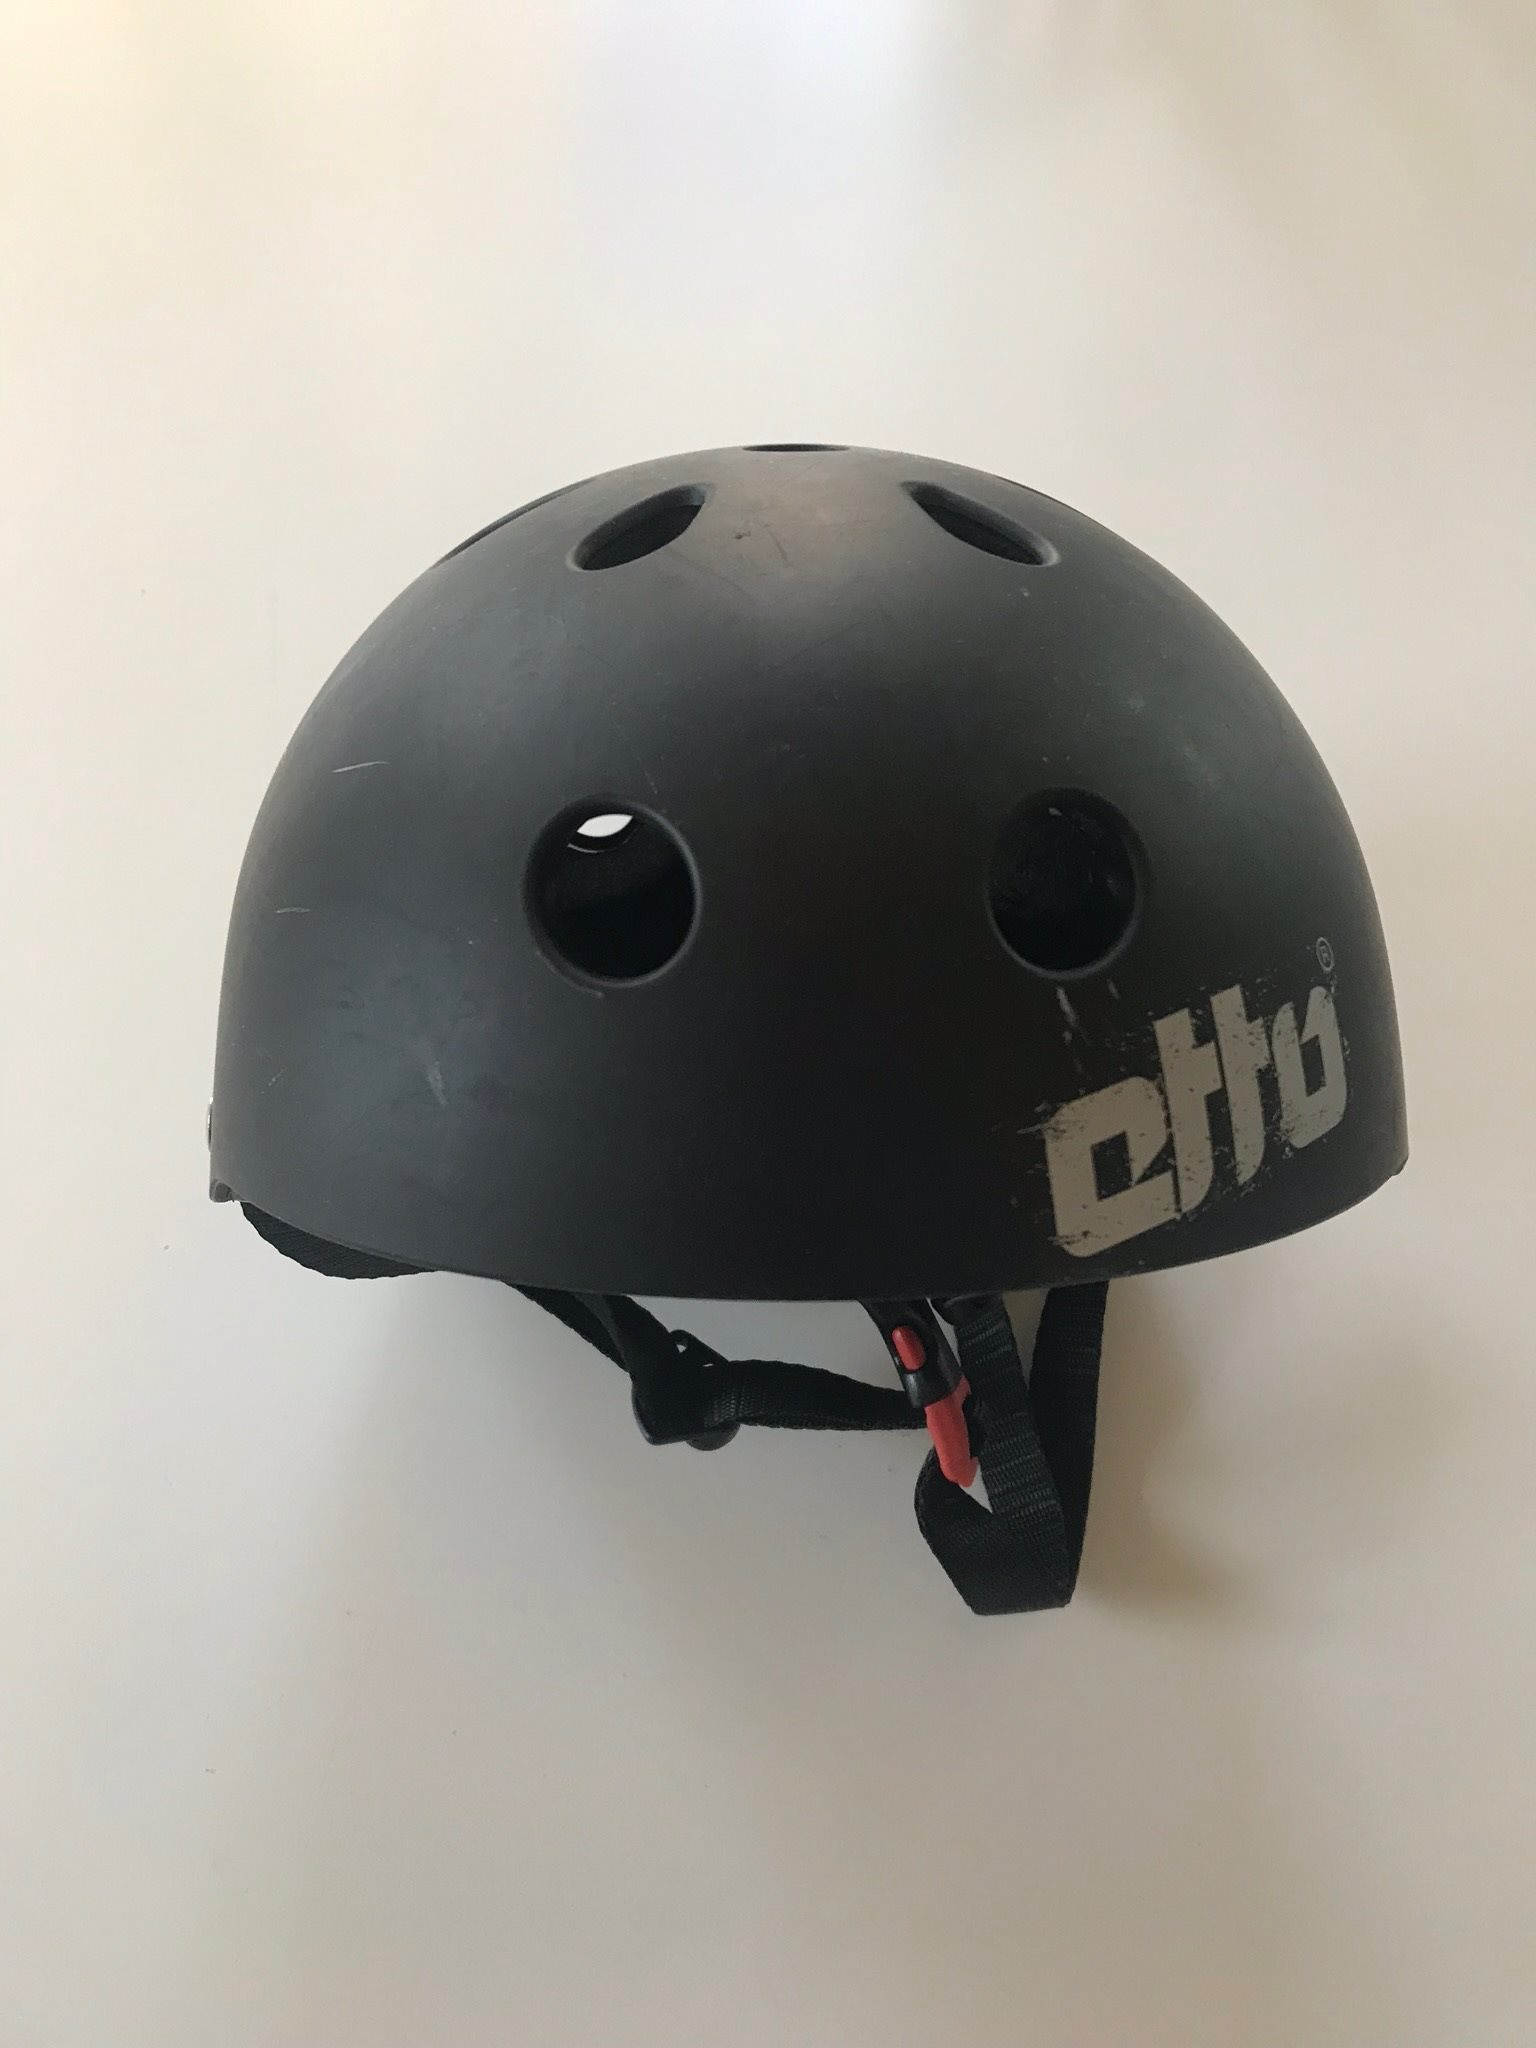 Otto - cykelhjälm - skatehjälm - hjälm - barn -.. (329641642) ᐈ Köp ... 0a39bcde76878